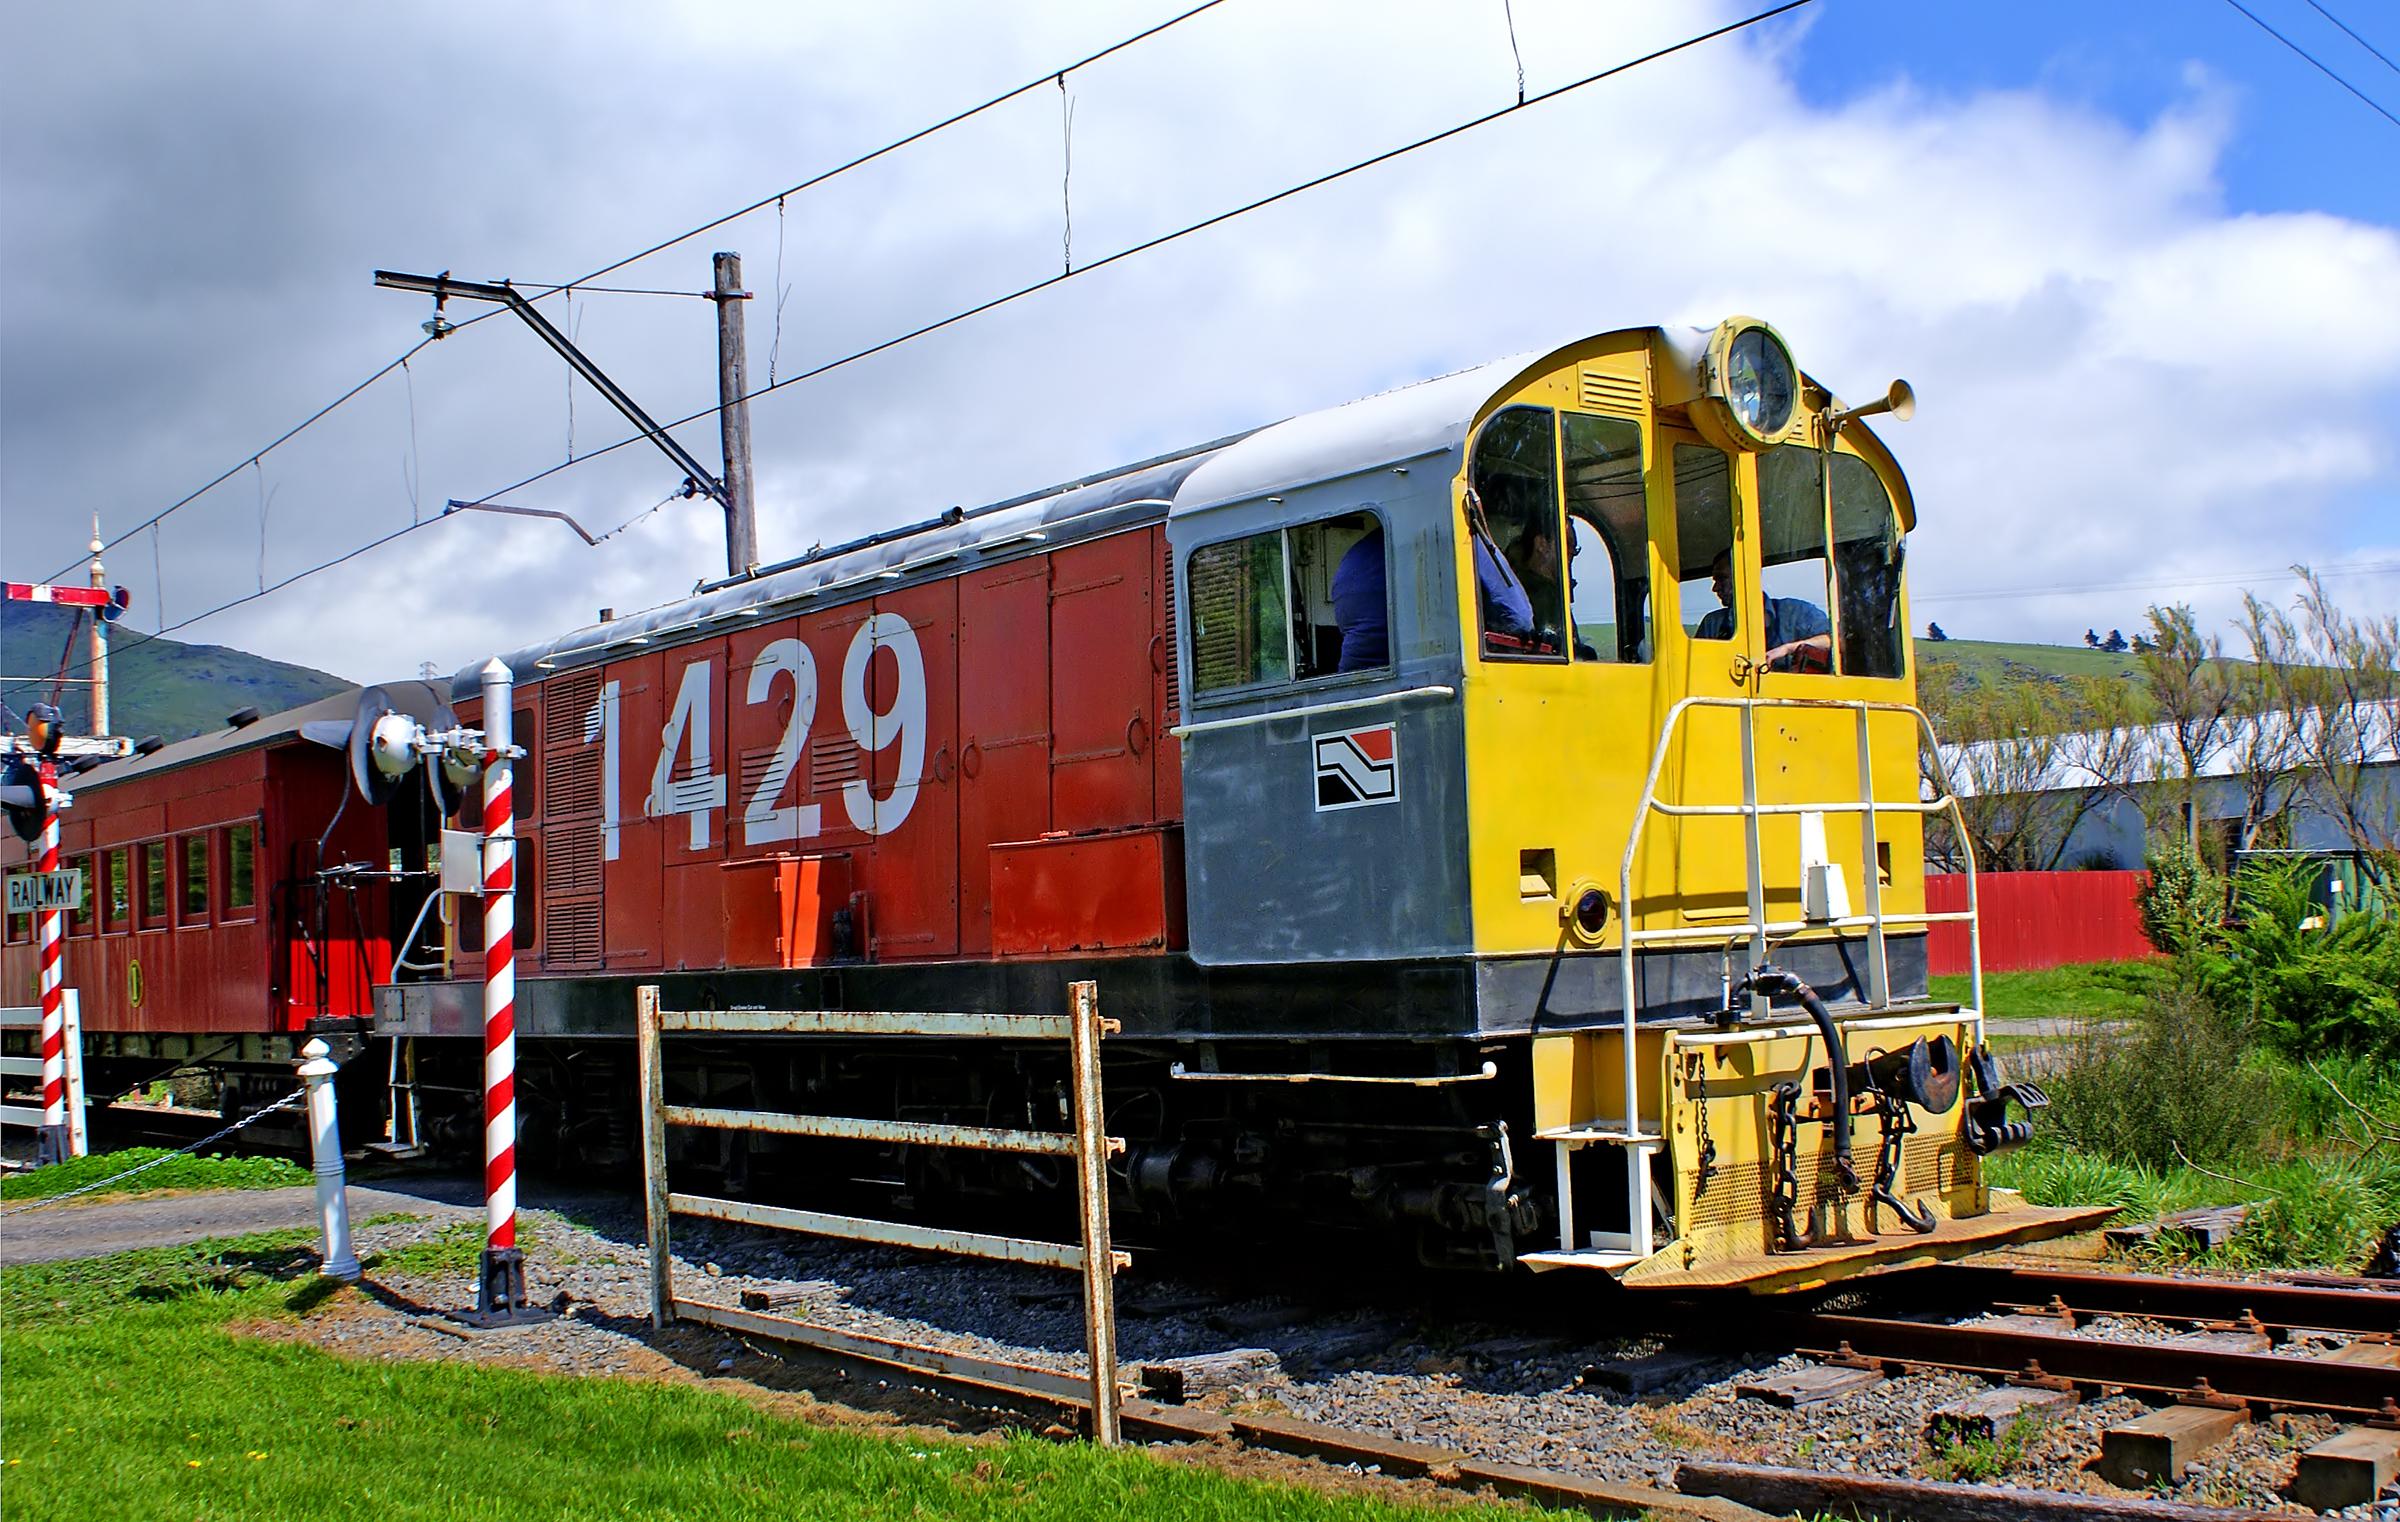 Bernard Spragg - New Zealand TR class locomotive